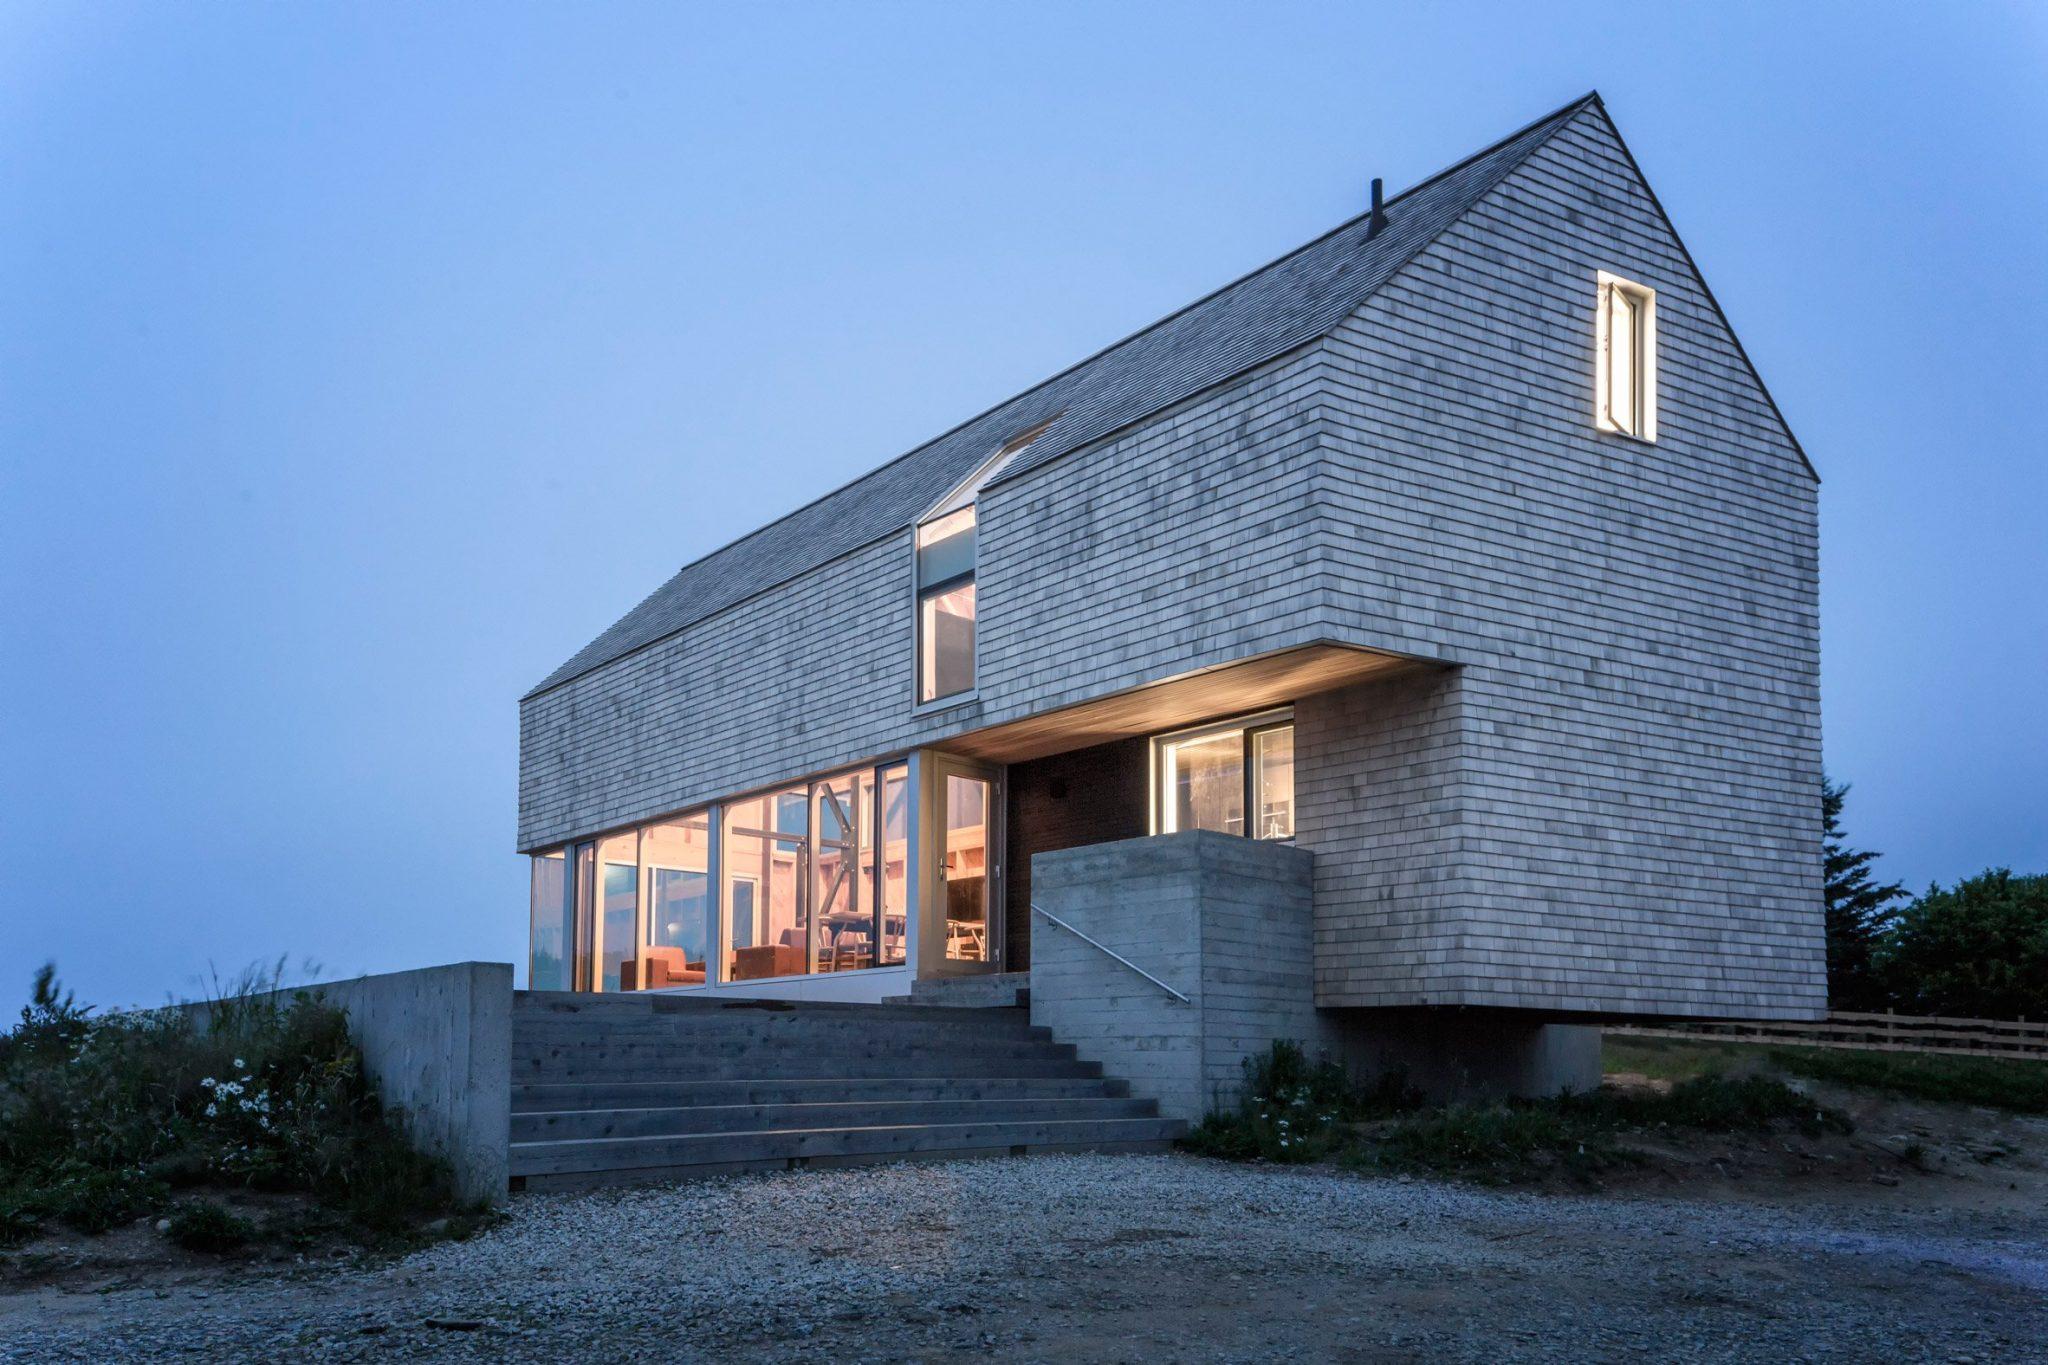 dreamy coastal house by studio mackay lyons sweetapple 2 Dreamy Coastal House by Studio MacKay Lyons Sweetapple